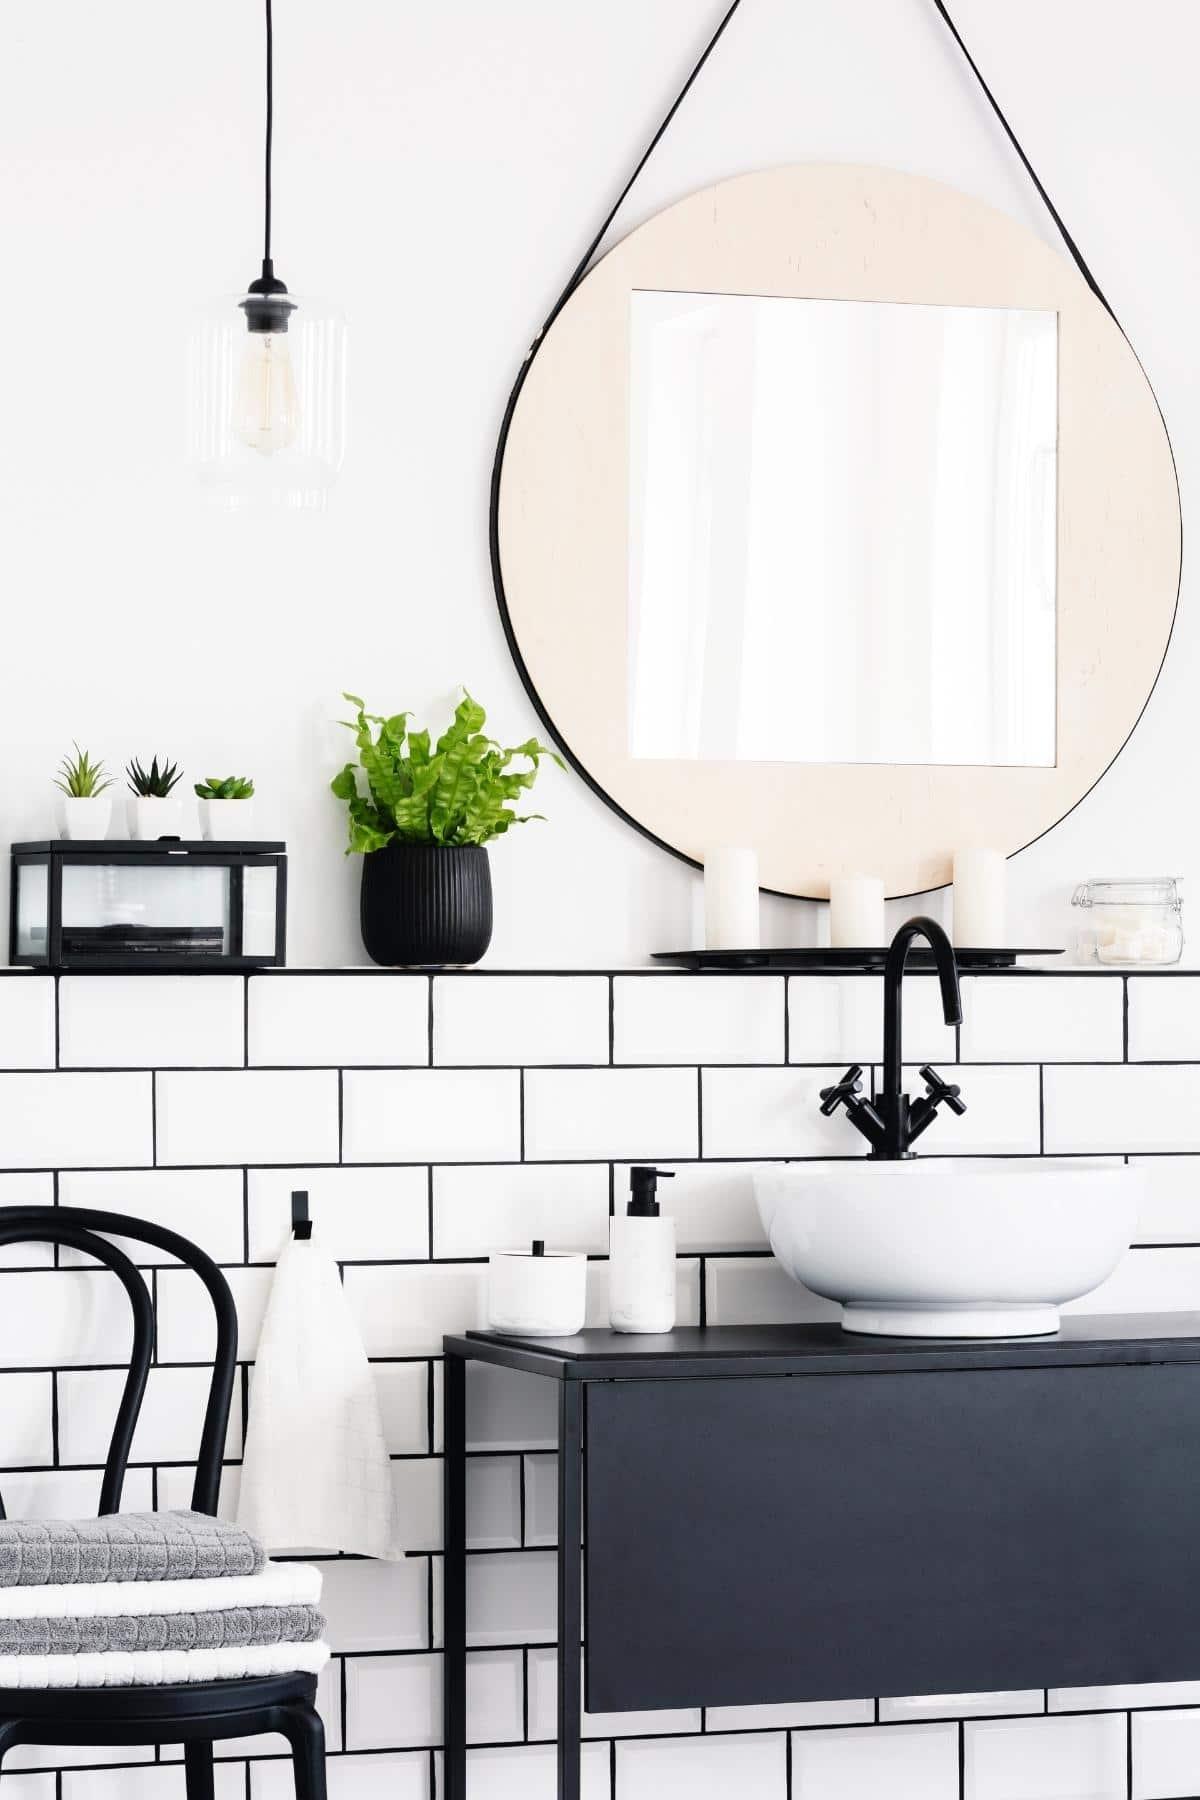 Bathroom-Reno-Marble tiles